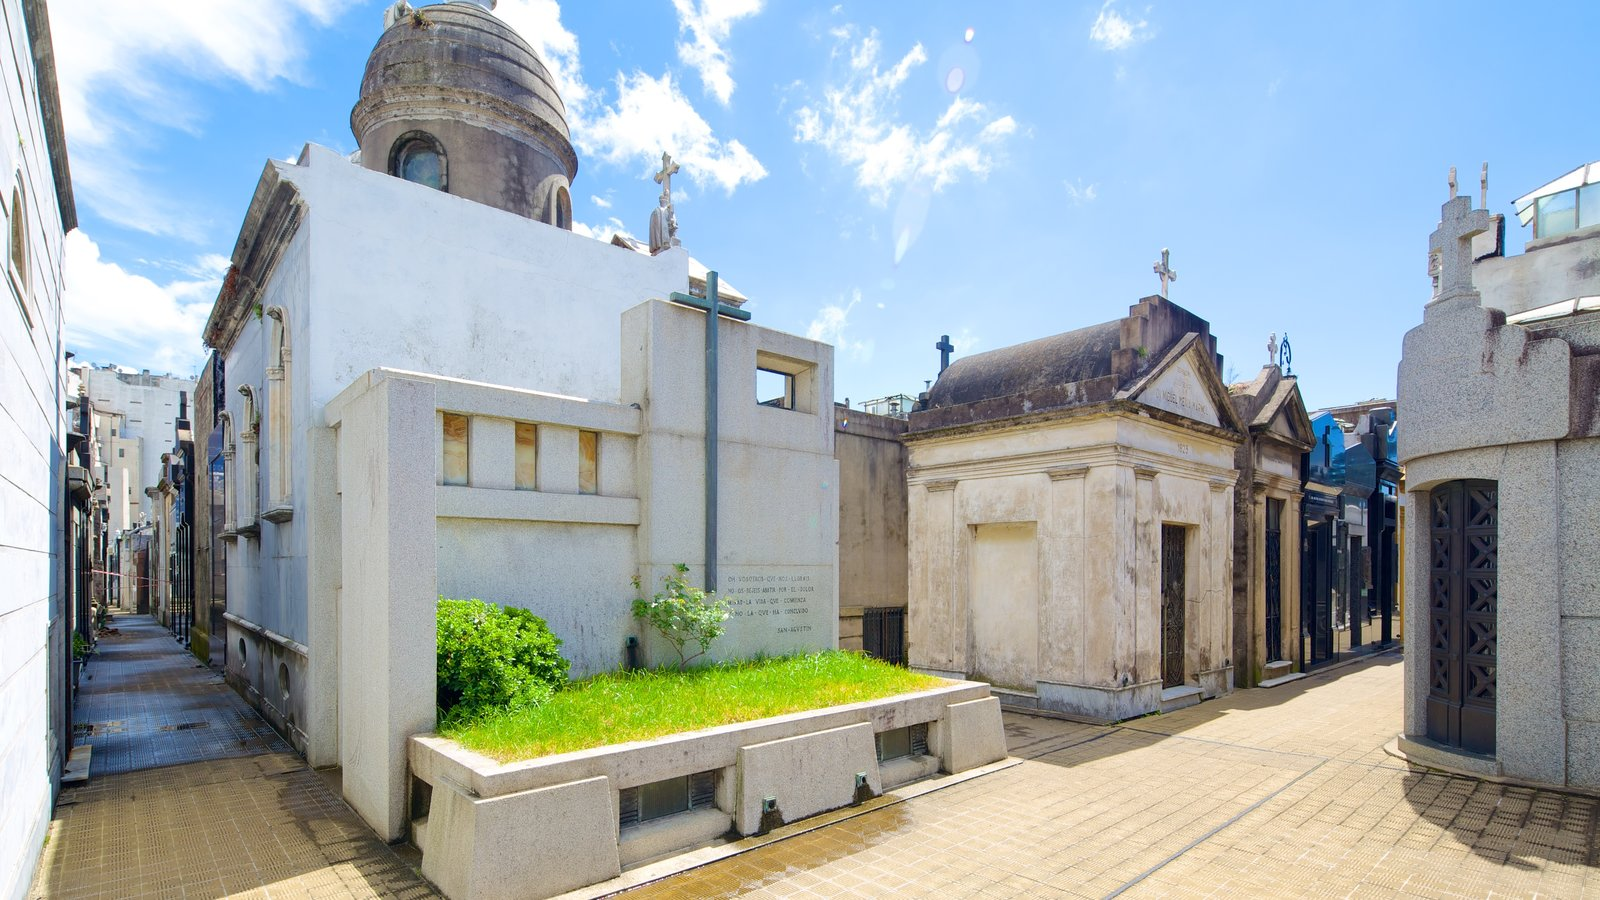 Cementerio de la Recoleta que inclui um cemitério